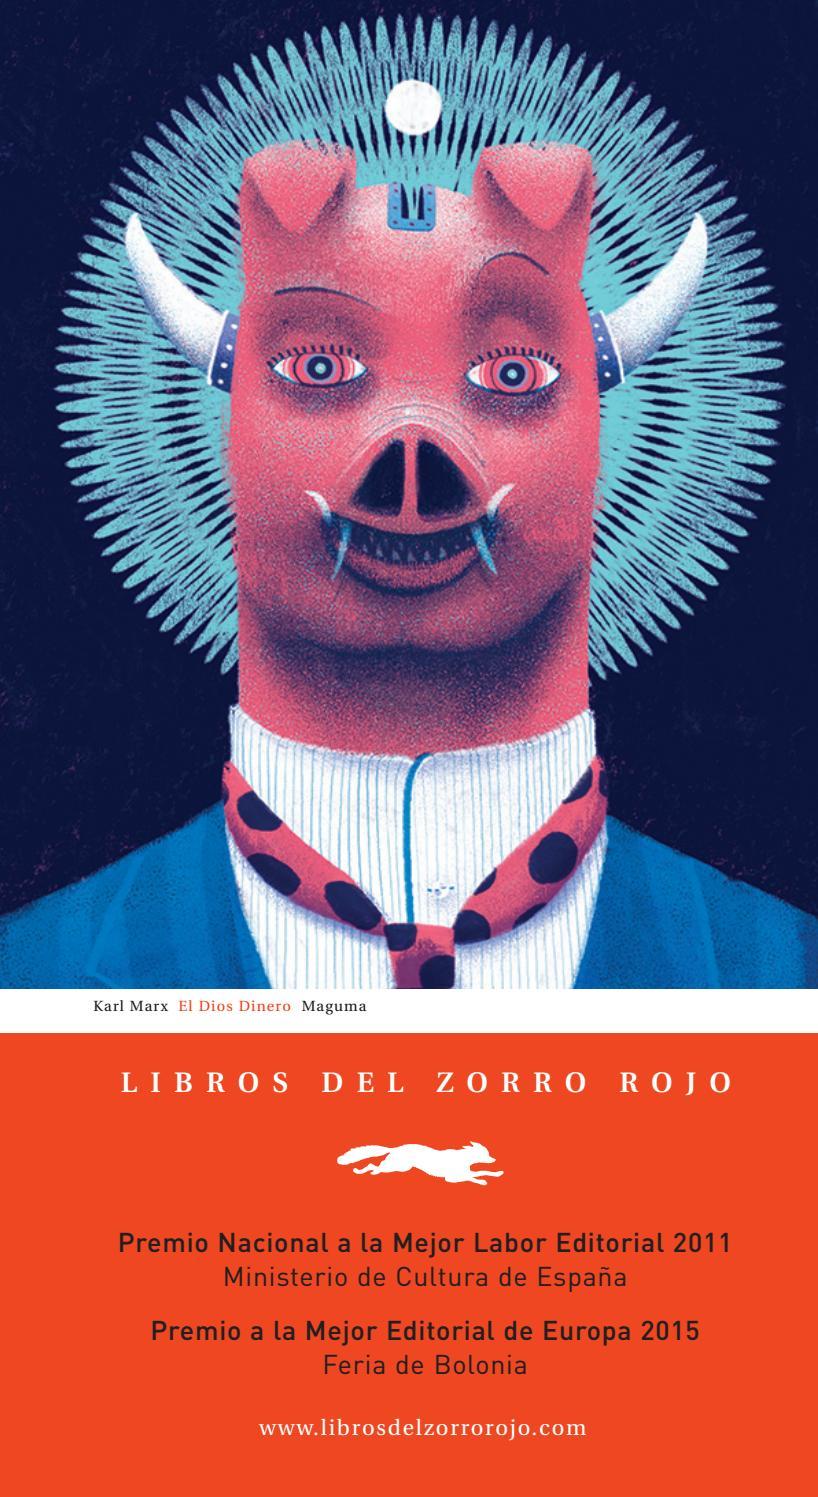 Catalogo Juvenil Adulto Otoño 2017 By Libros Del Zorro Rojo